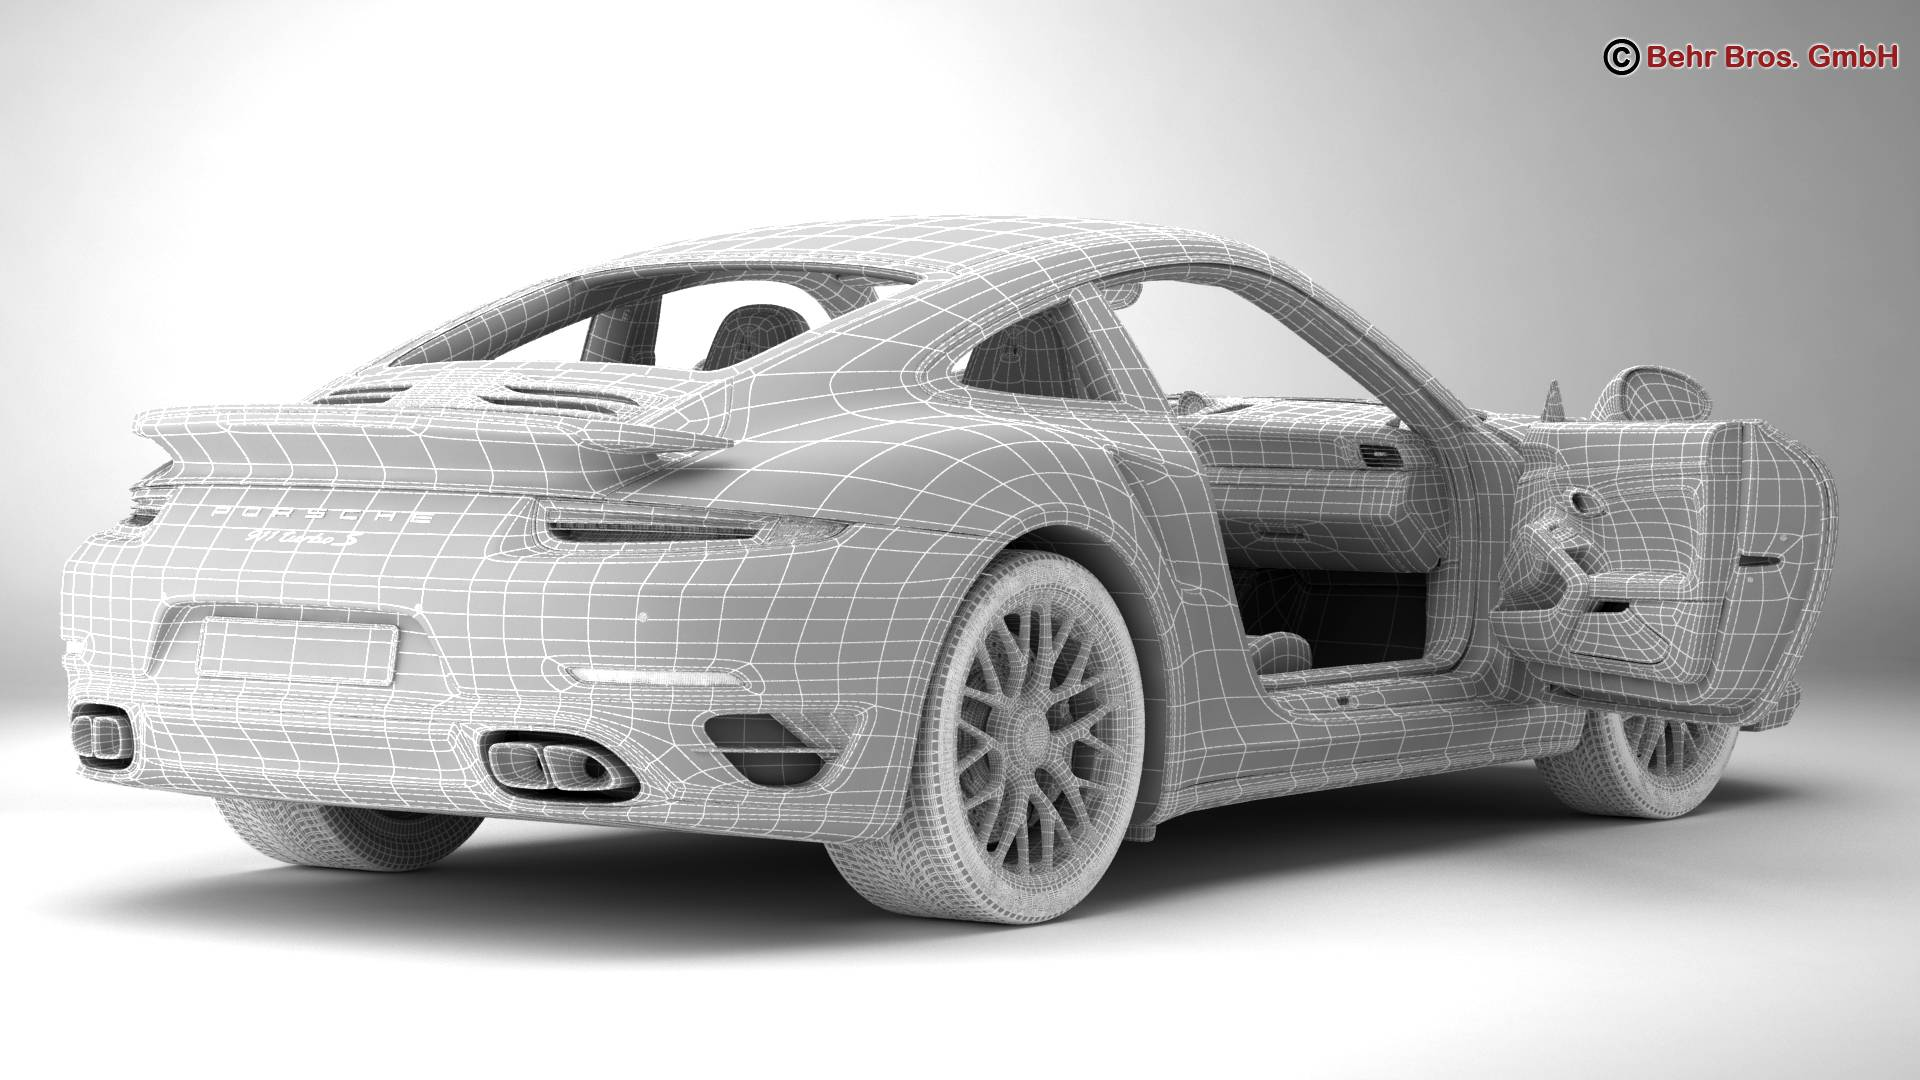 porsche 911 turbo s 2014 3d model 3ds max fbx c4d lwo ma mb obj 212494